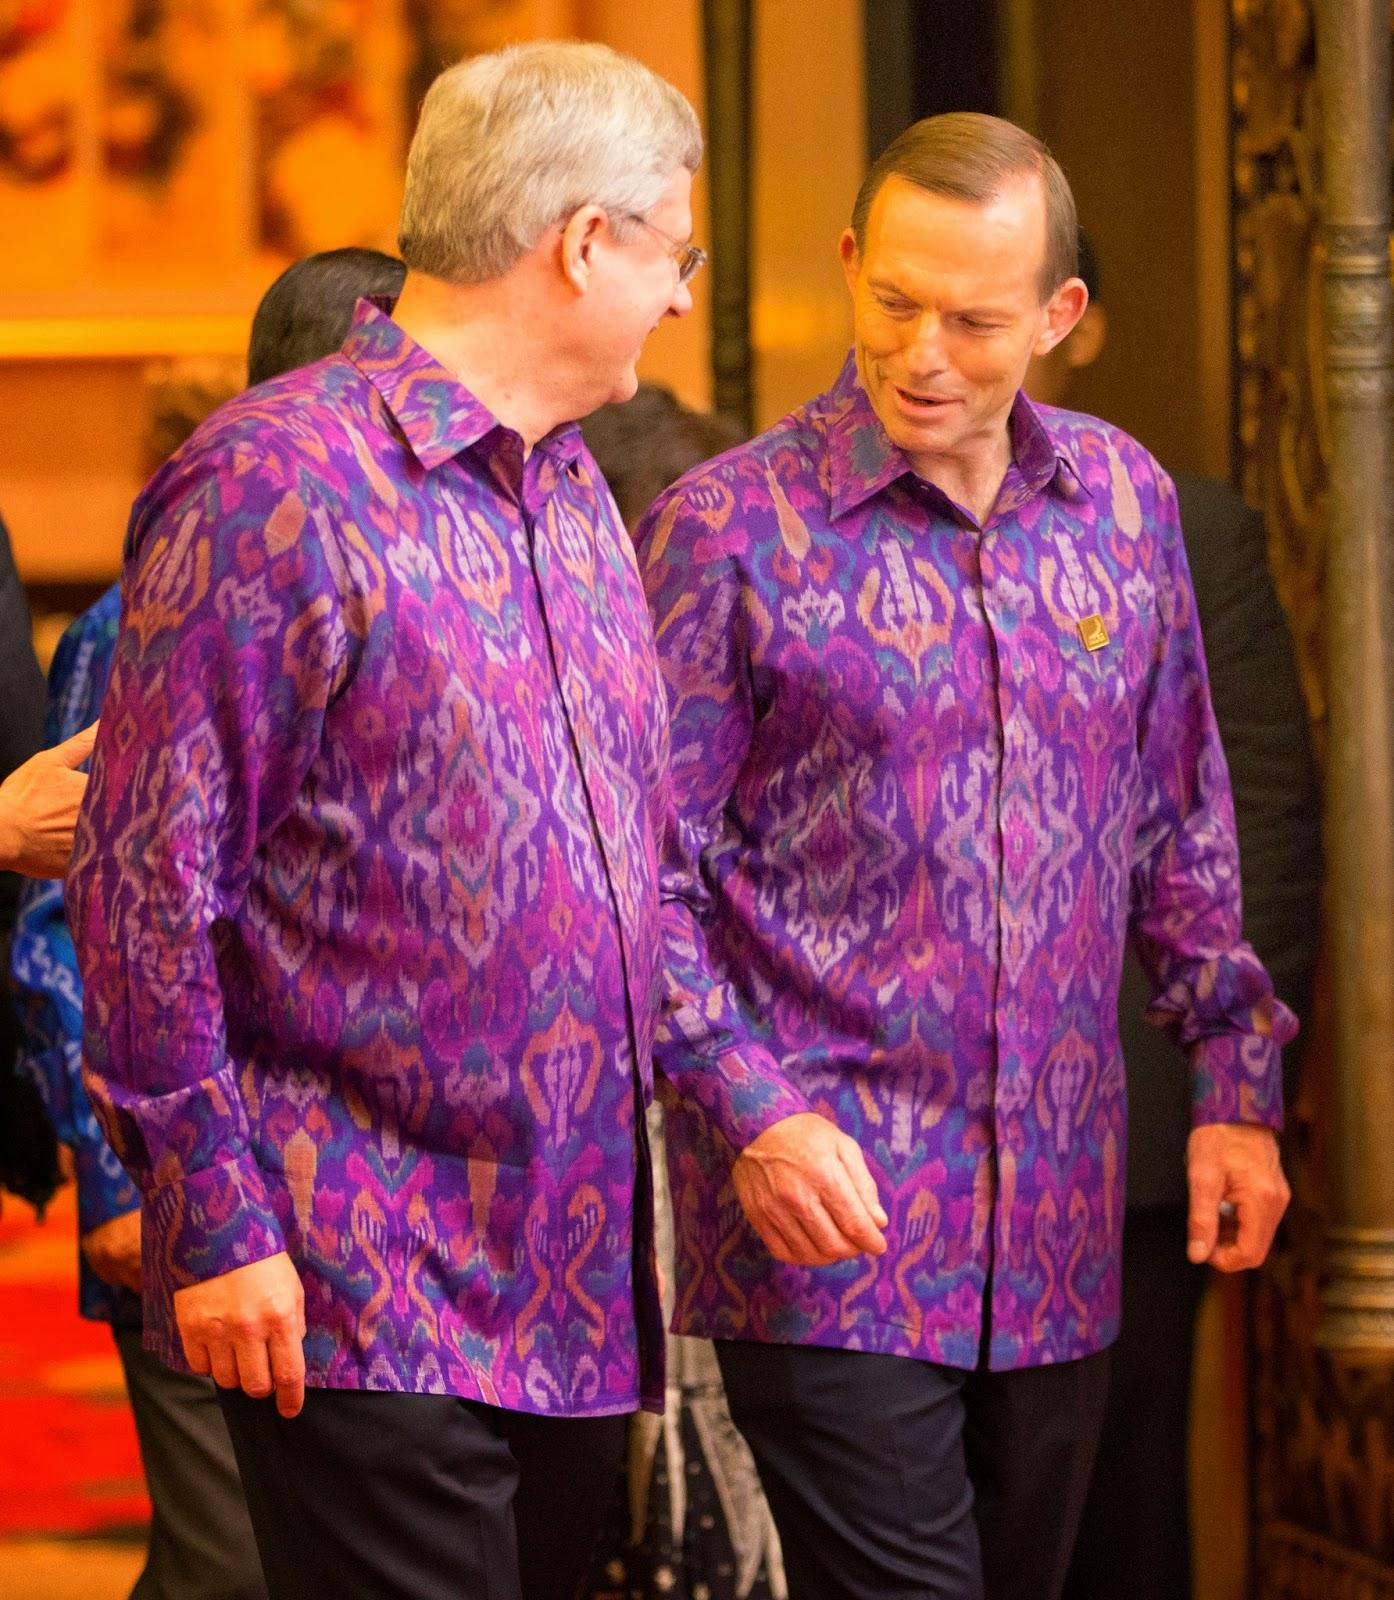 Stephen Harper & Tony Abbott, APEC Bali 13-10.